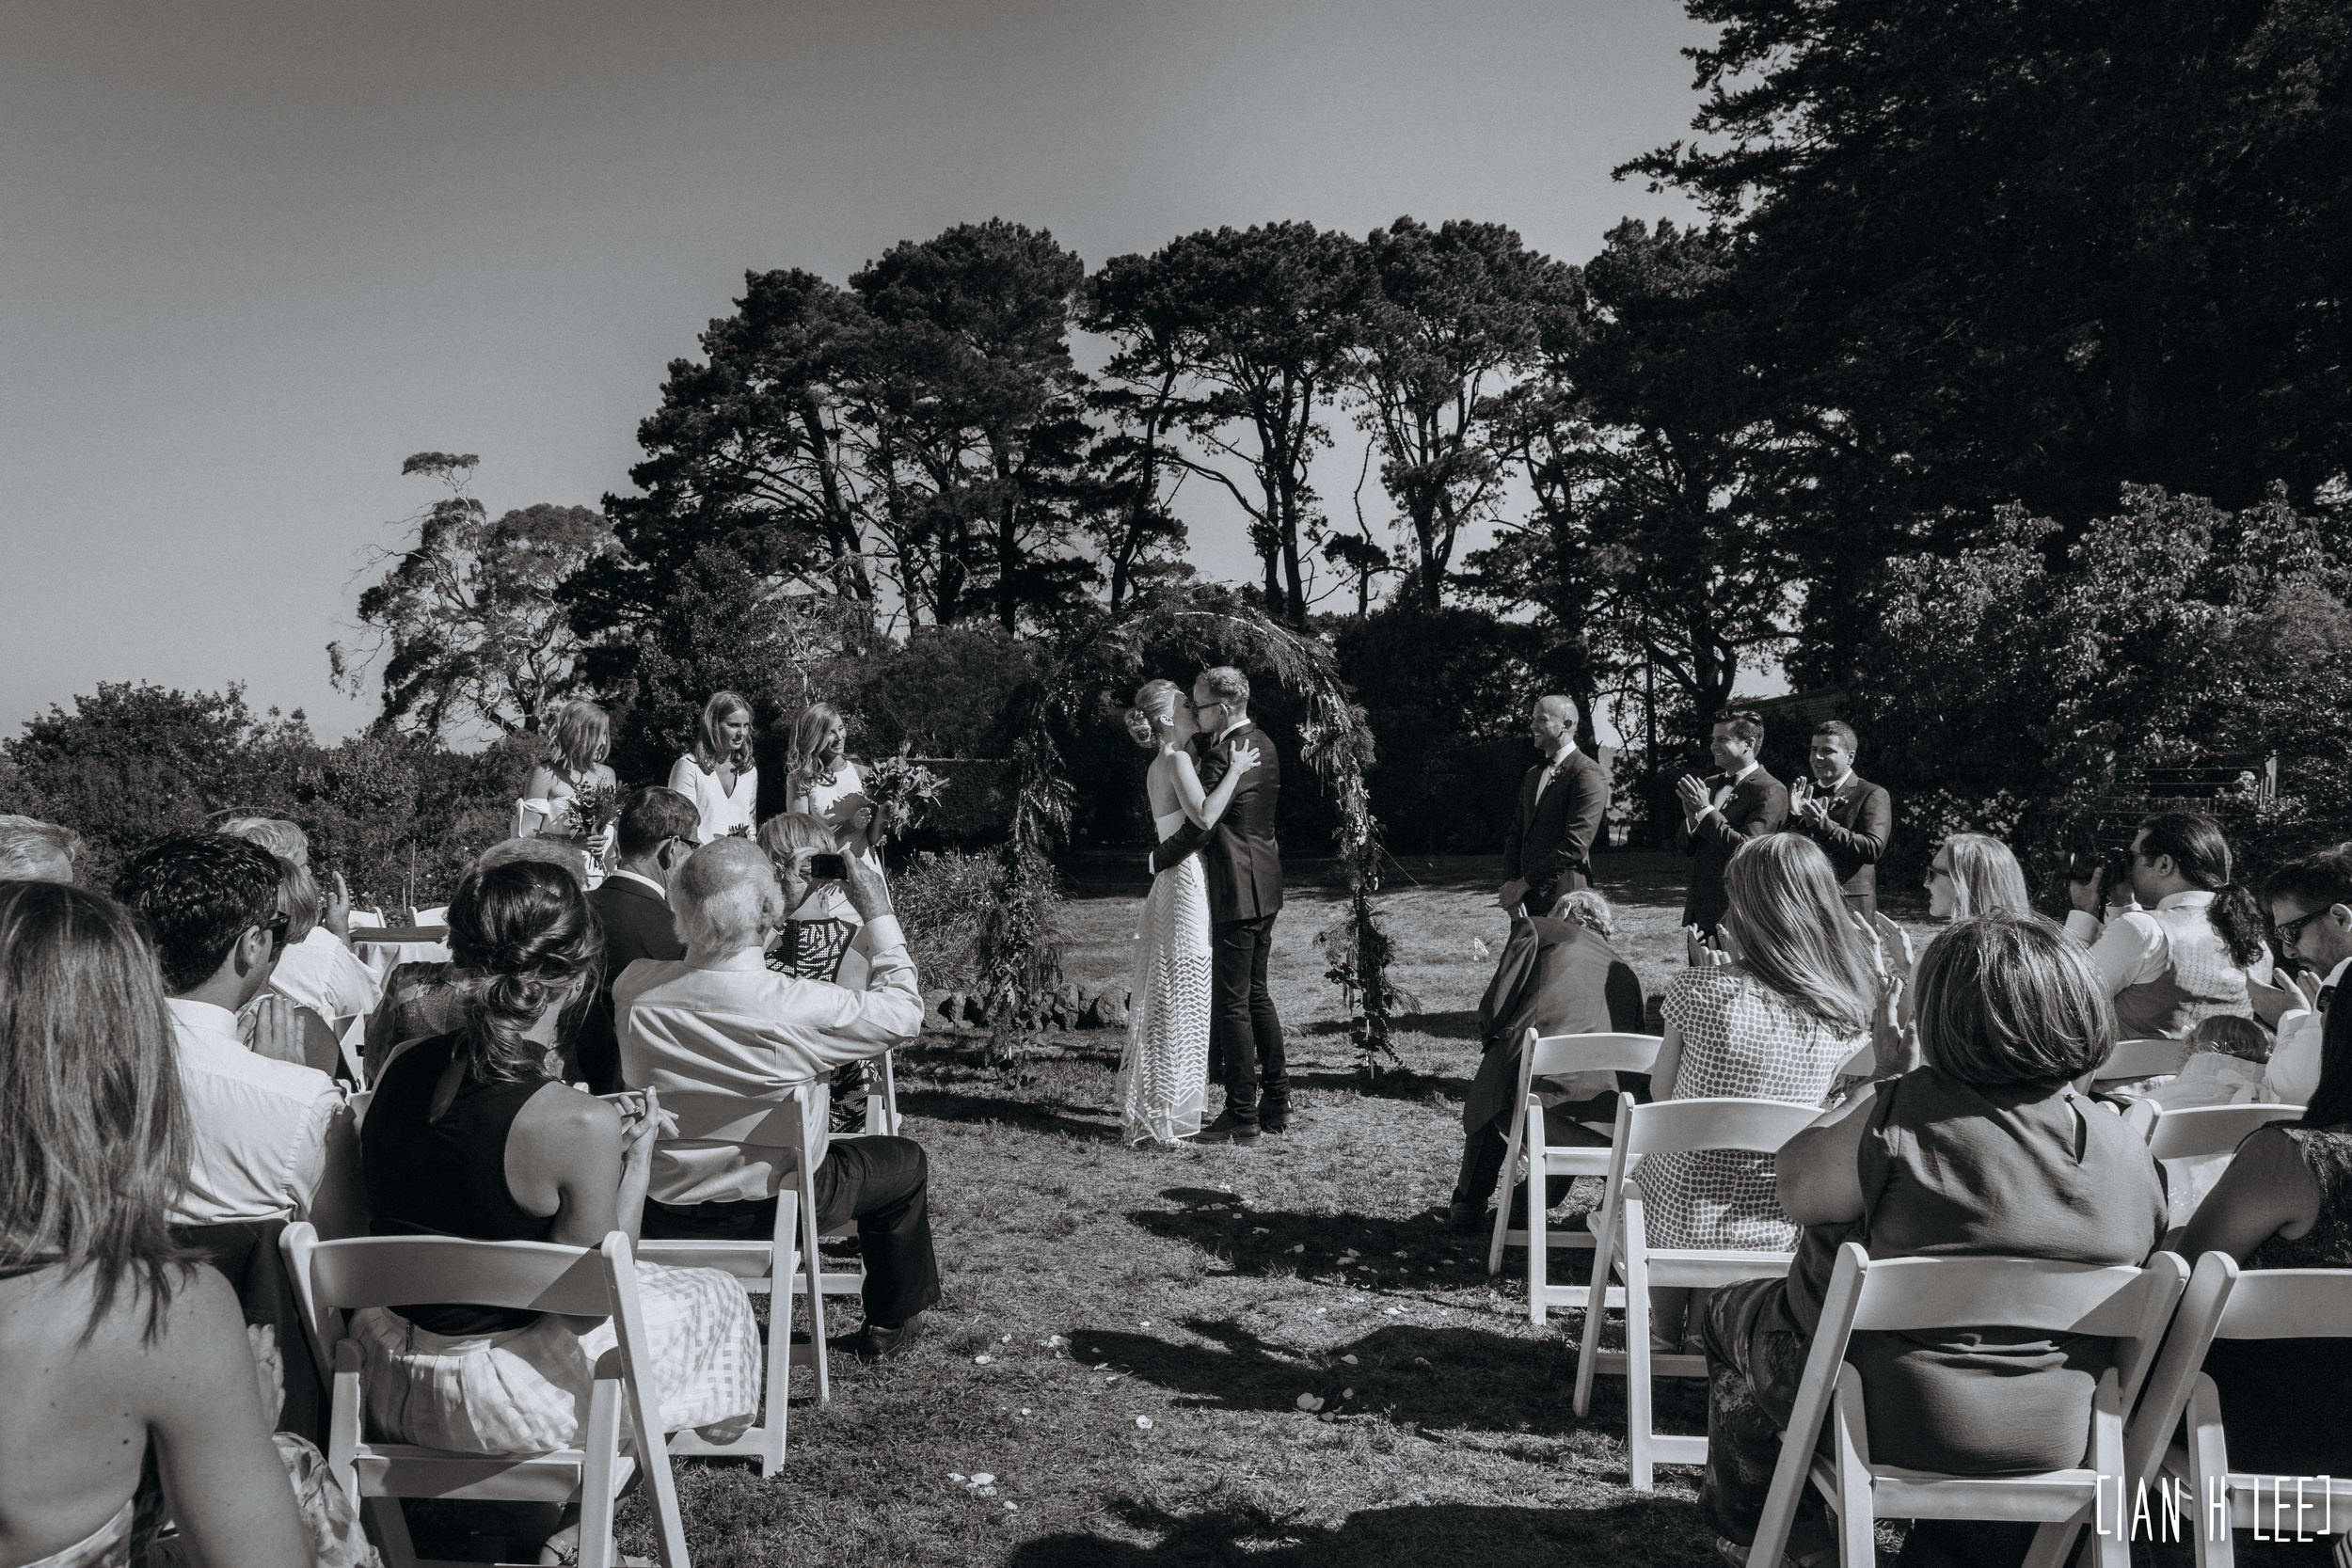 [Ian H Lee] Photography || Weddings - Melbourne || Ewan And Courtney -9740.jpg